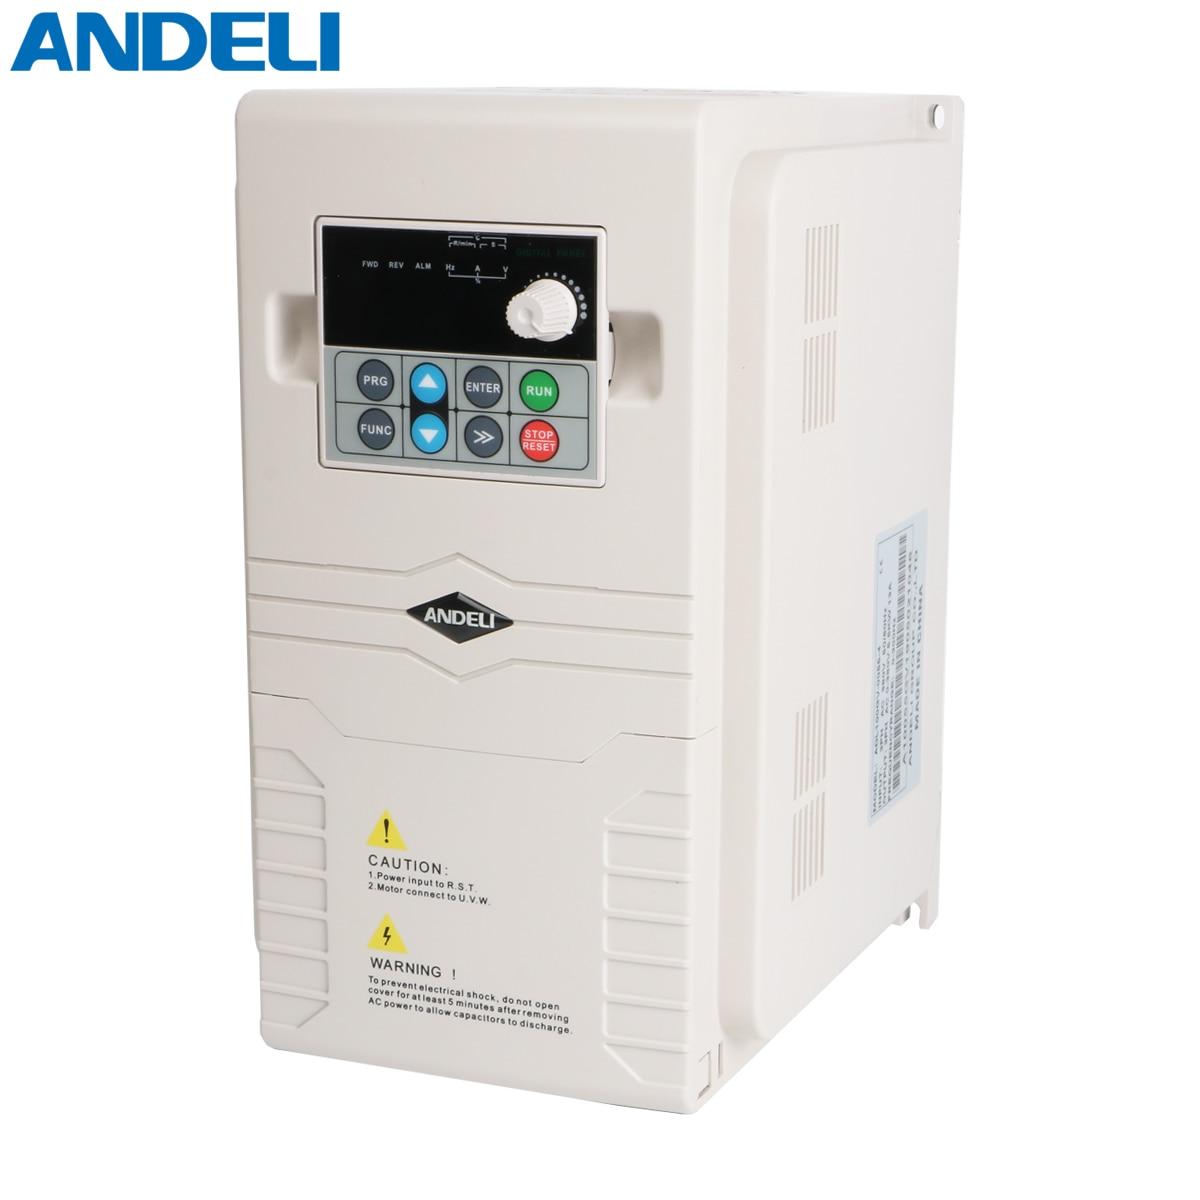 ANDELI ADL100G 380V 3.7KW 5hp vfd